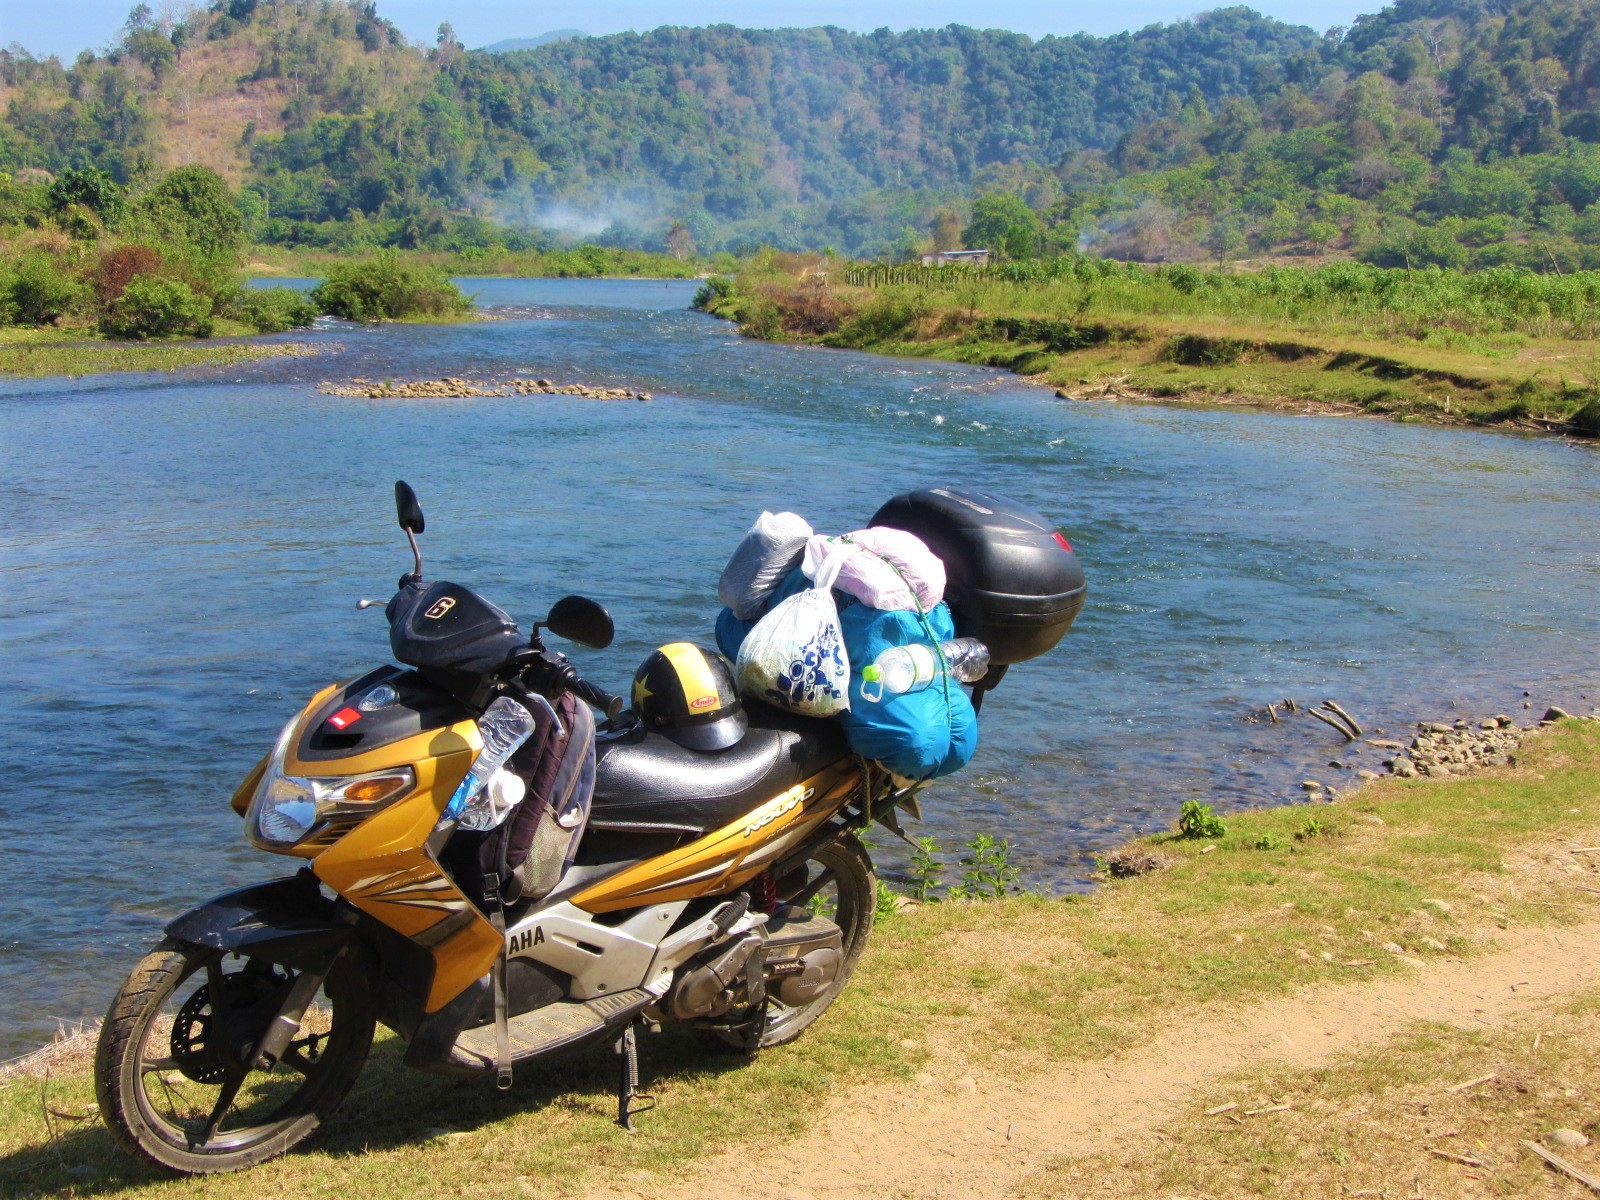 Camping on the La Nga River, Binh Thuan Province, Vietnam